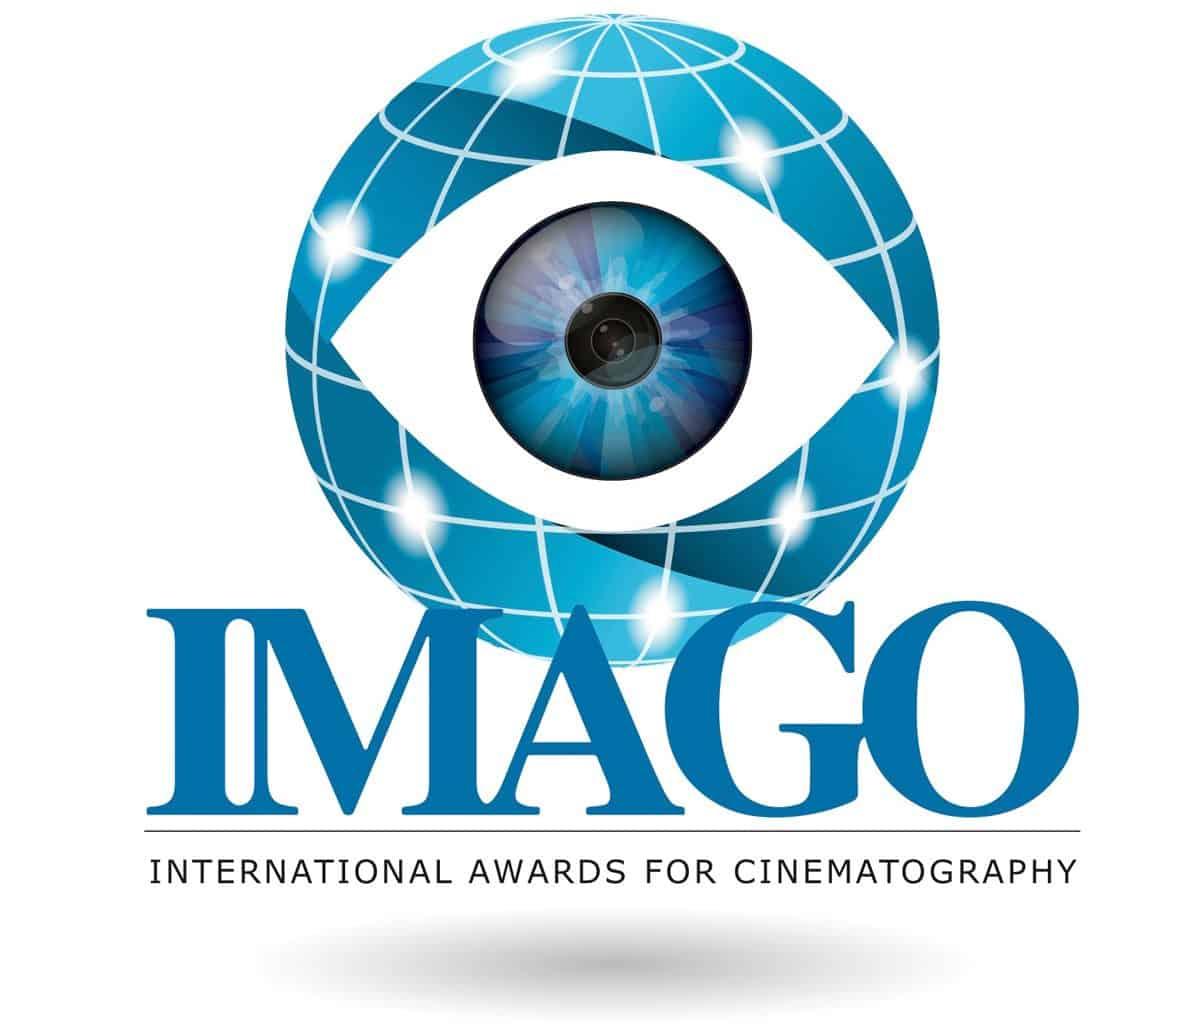 Maynards Imago School prepares for next chapter - News